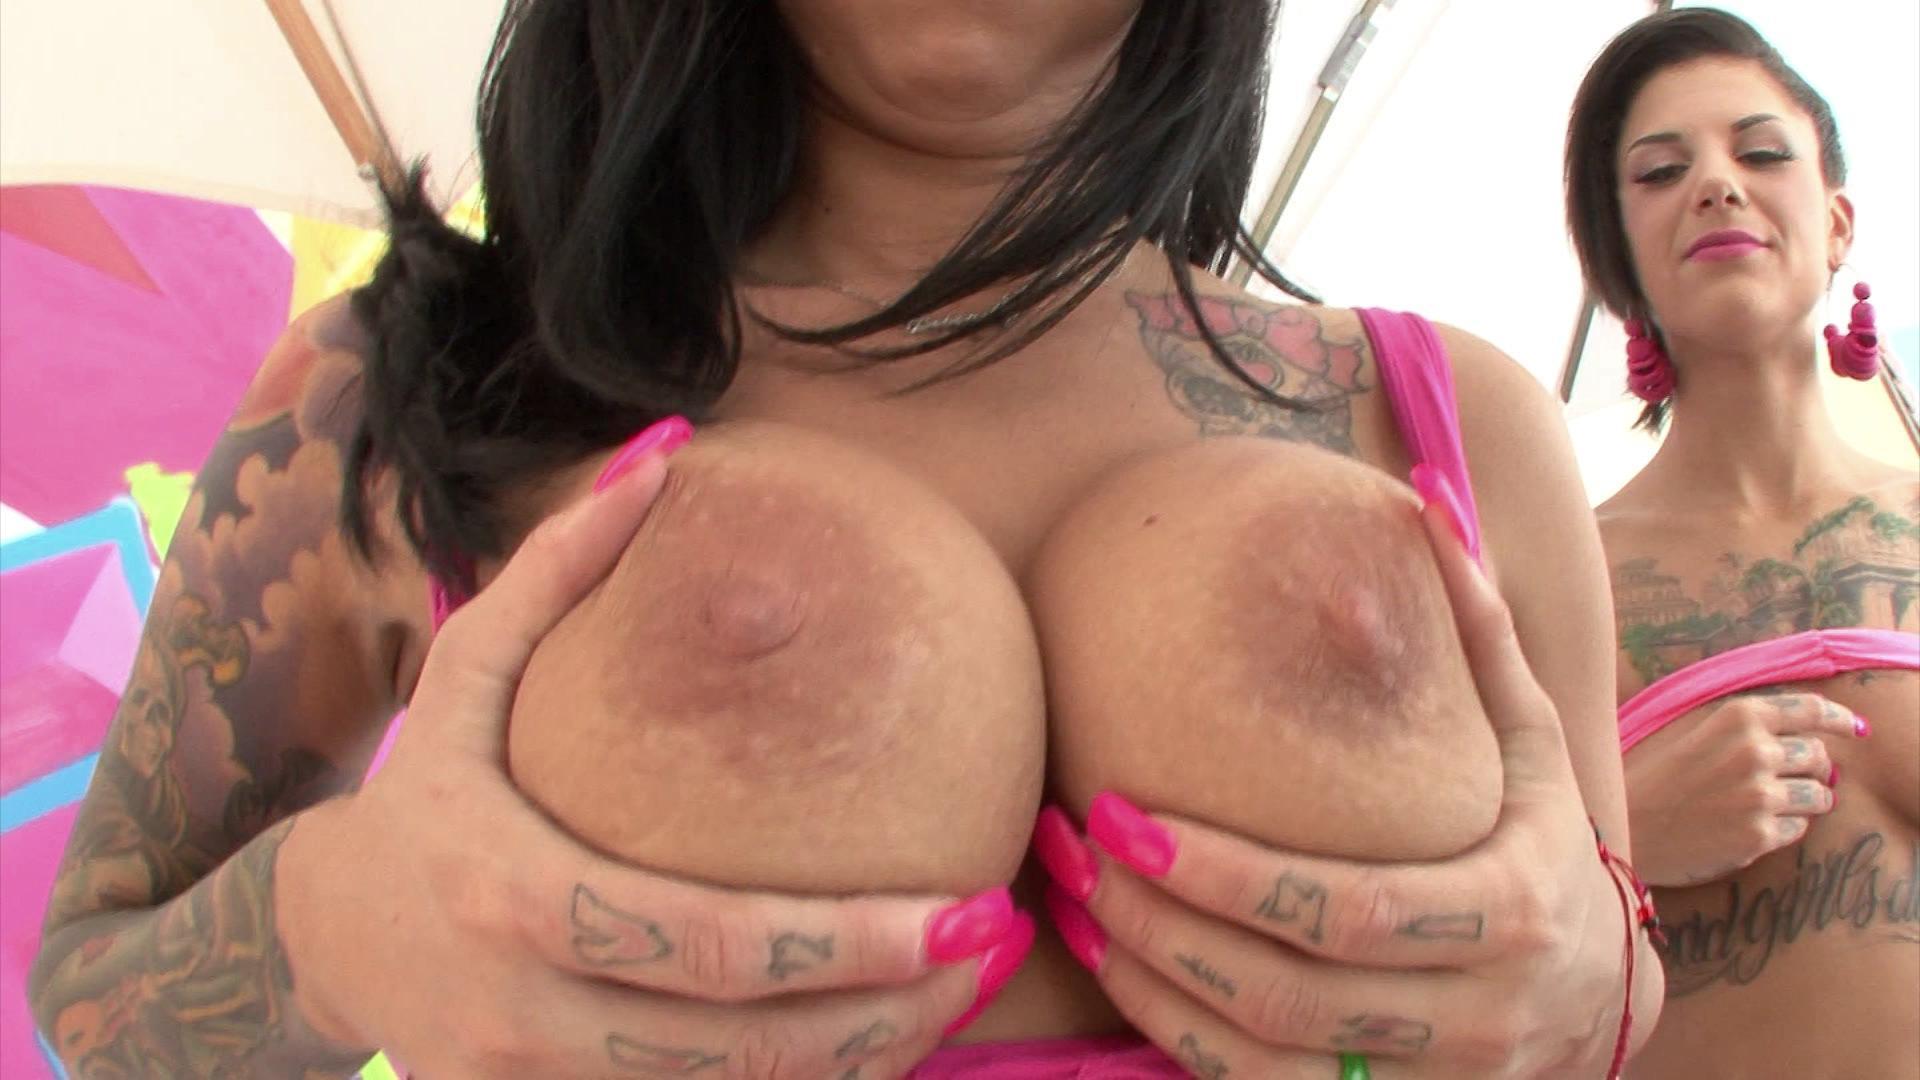 Alt Porn Videos alt porn porn video » skye blue summer cummings » skye and